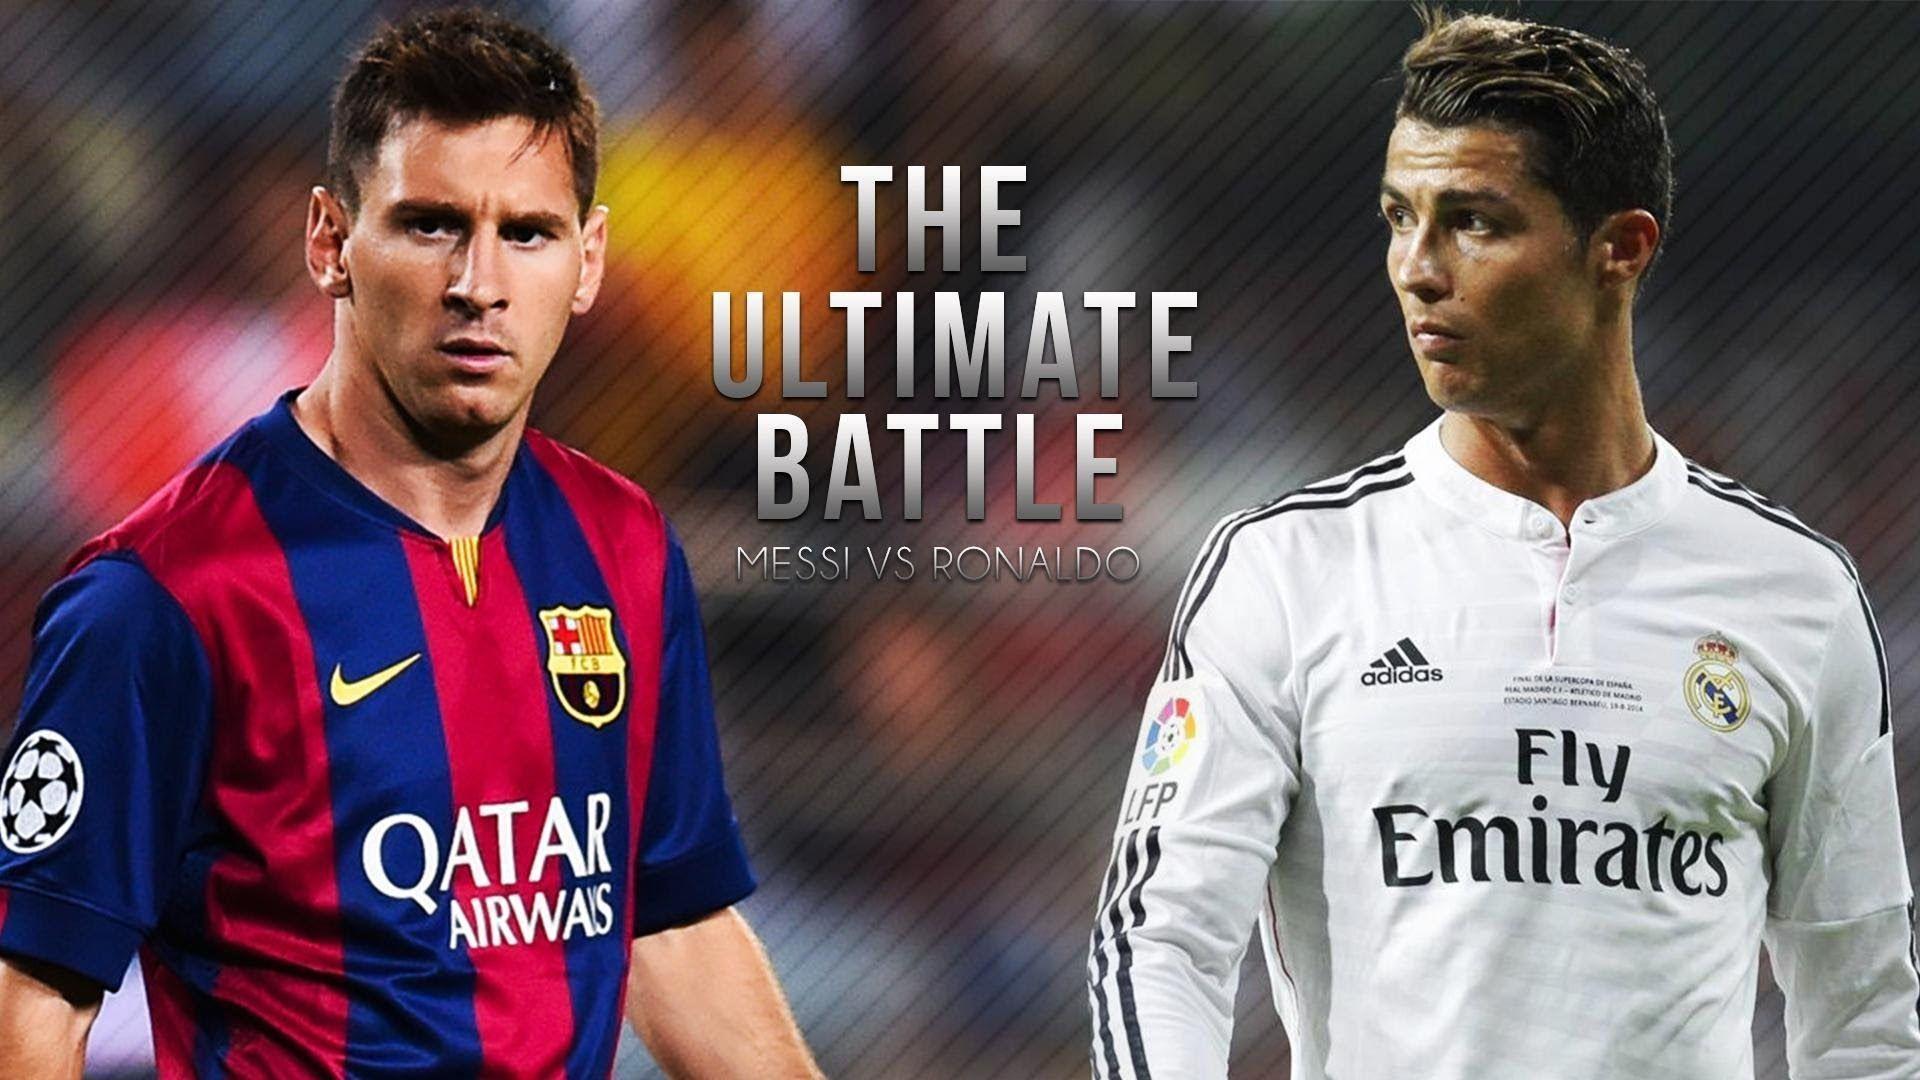 Messi Vs Ronaldo Wallpapers 2017 Hd Wallpaper Cave